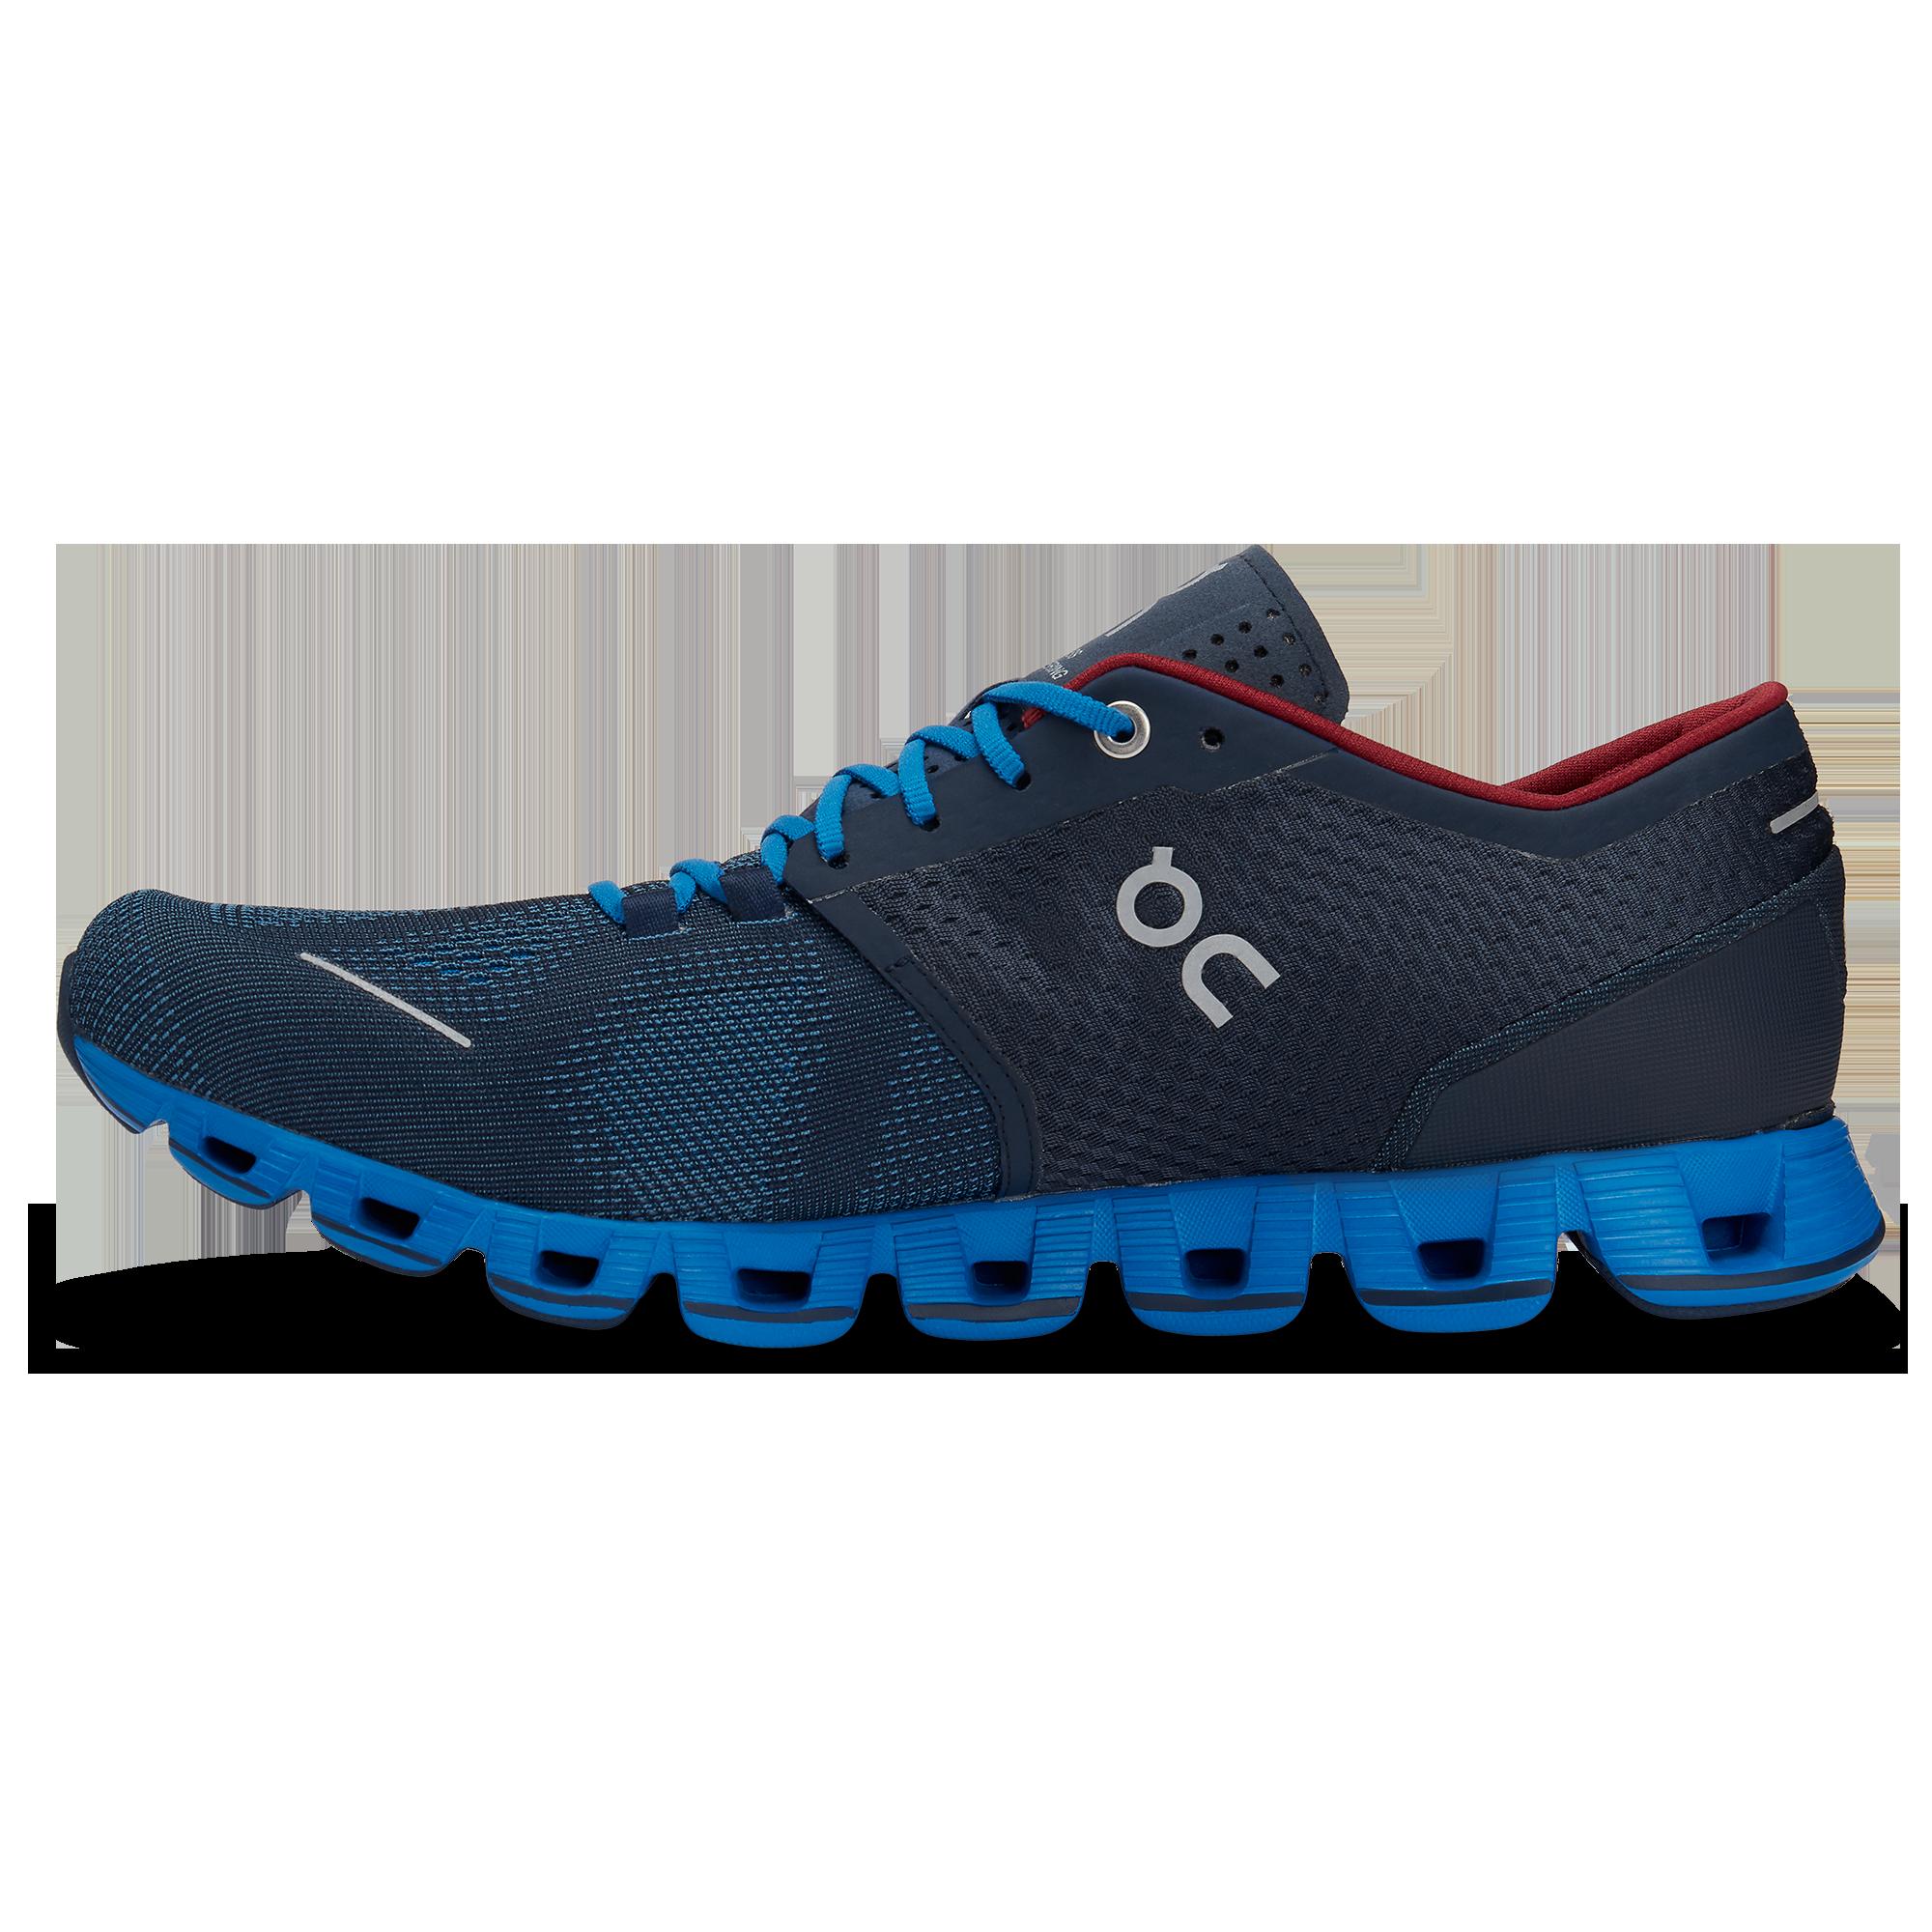 Cloud X - Workout \u0026 Training Shoe   On